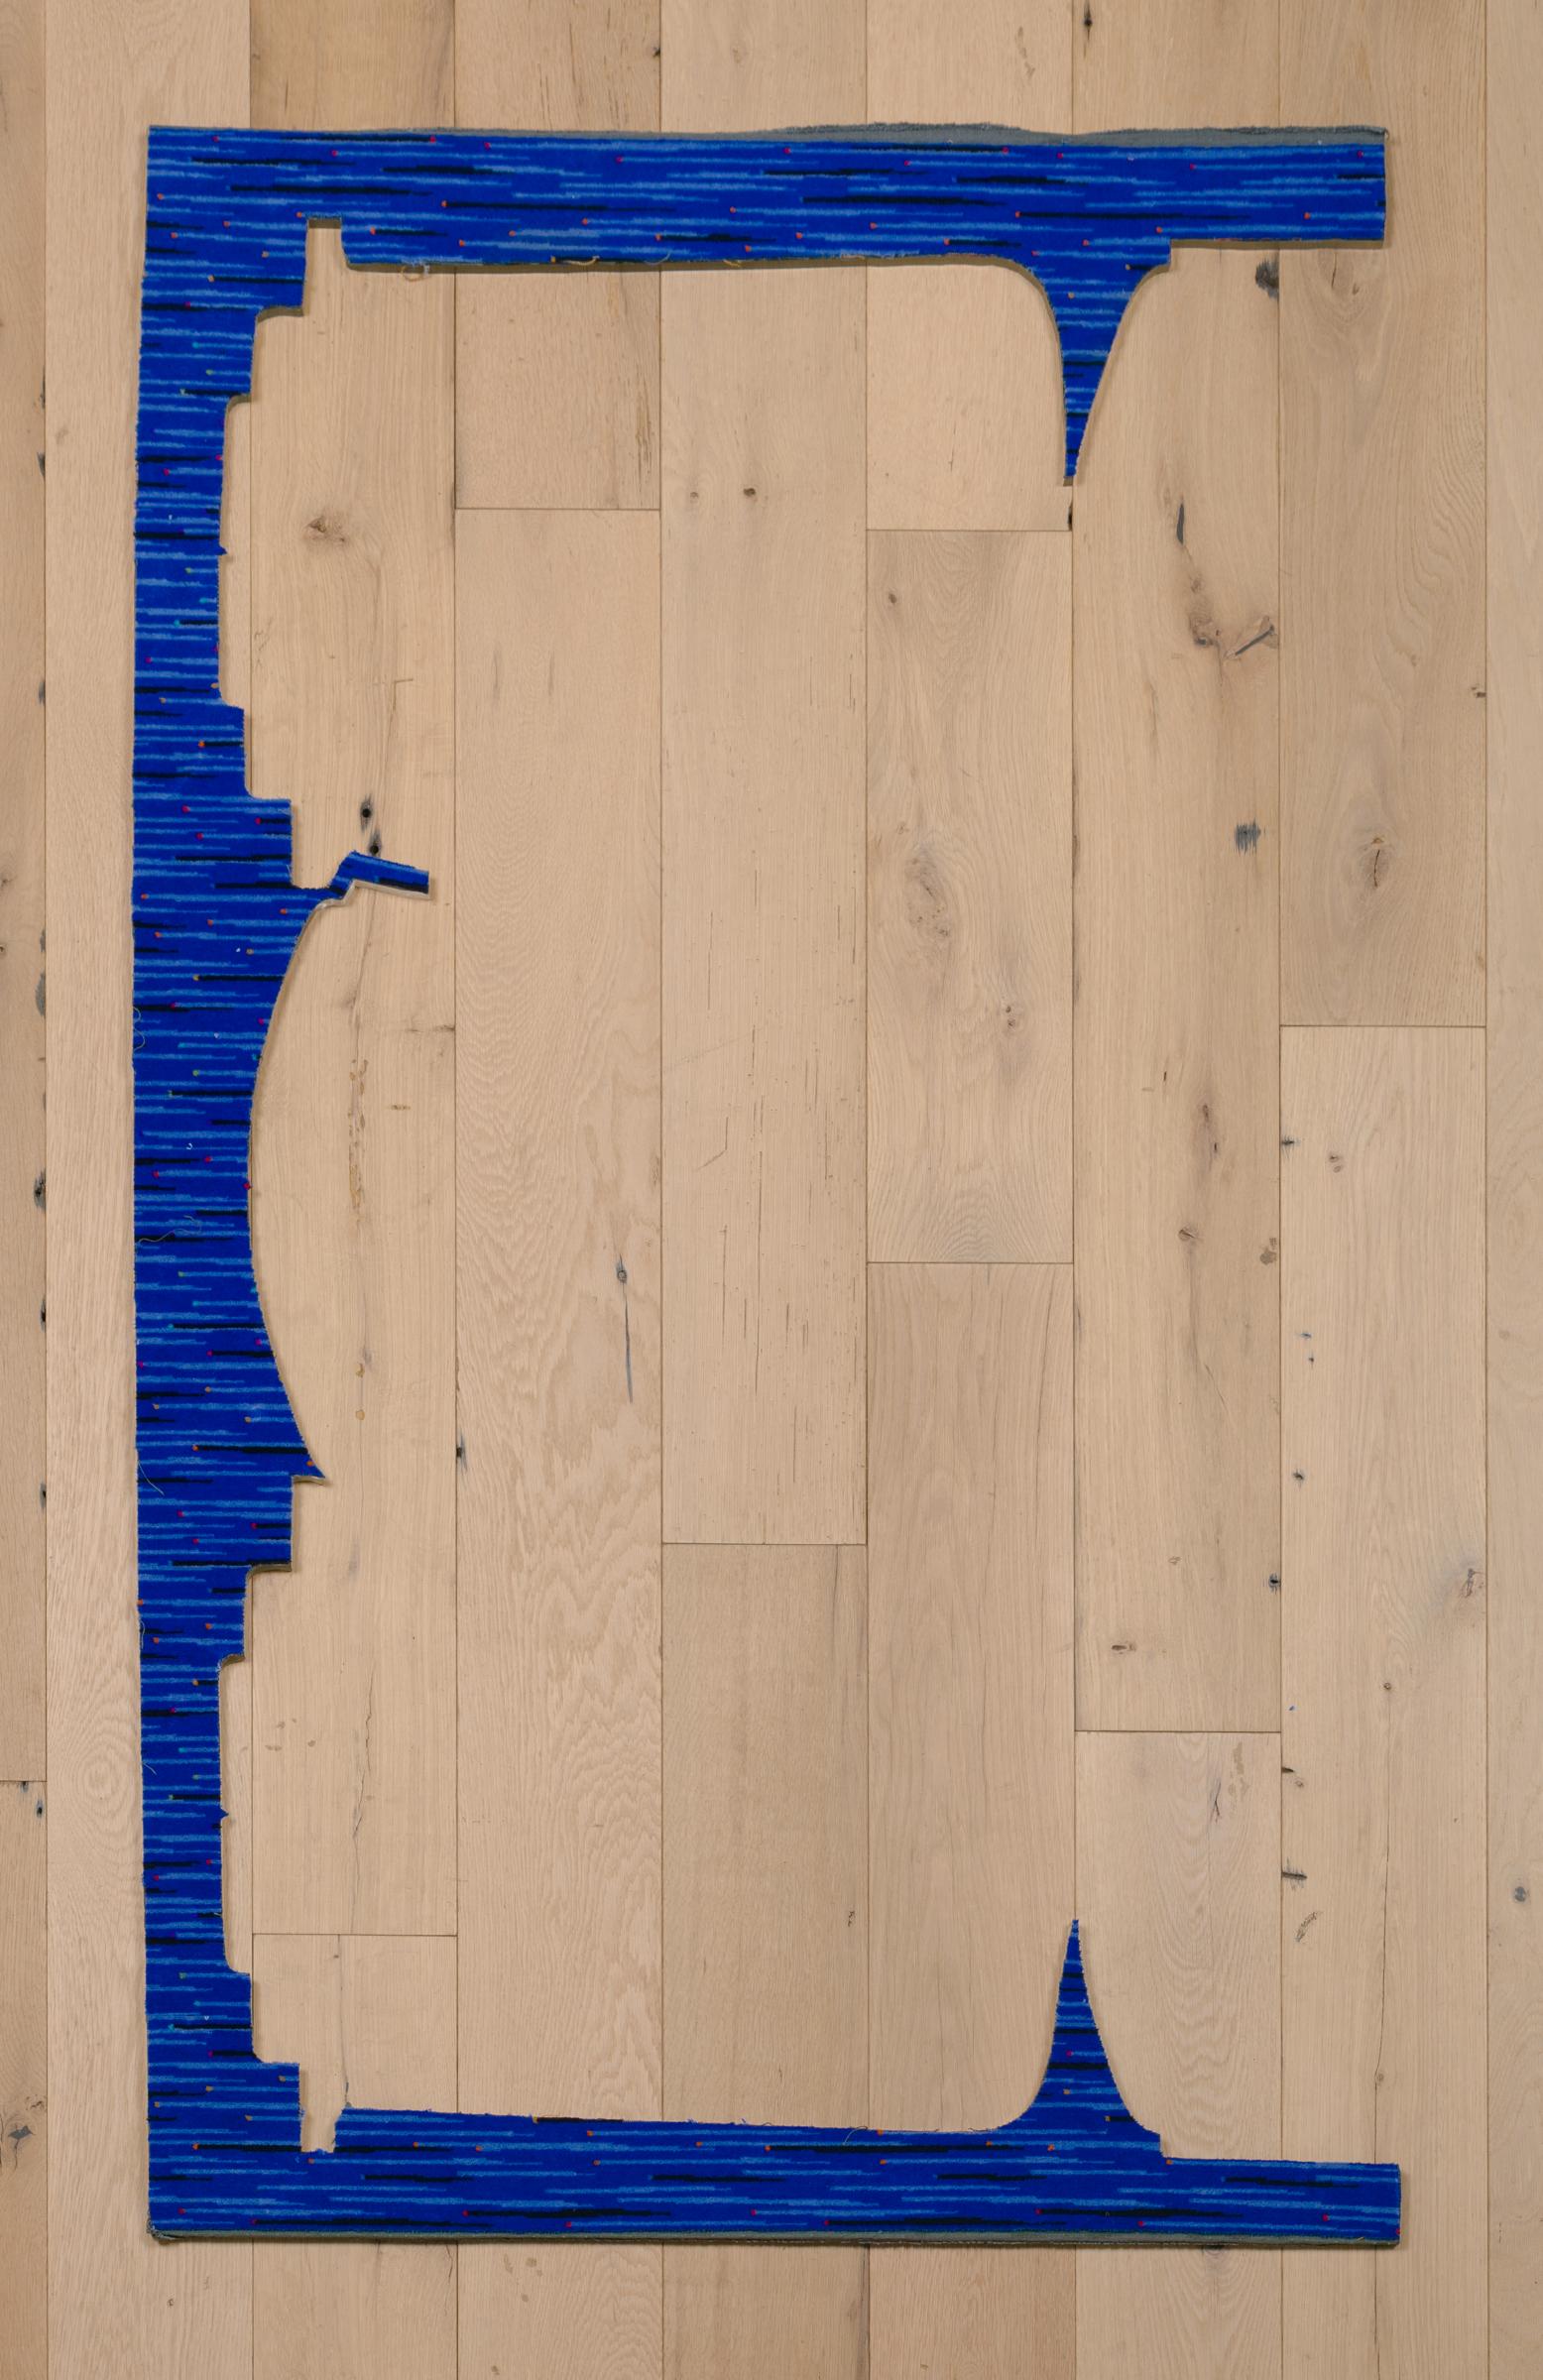 Jessica Vaughn, Untitled (Carbon Blue) , 2017, fabric scraps procured from manufacturer (09/2015-11/2016) on plexi, 61 × 36 ½ × ½ in.